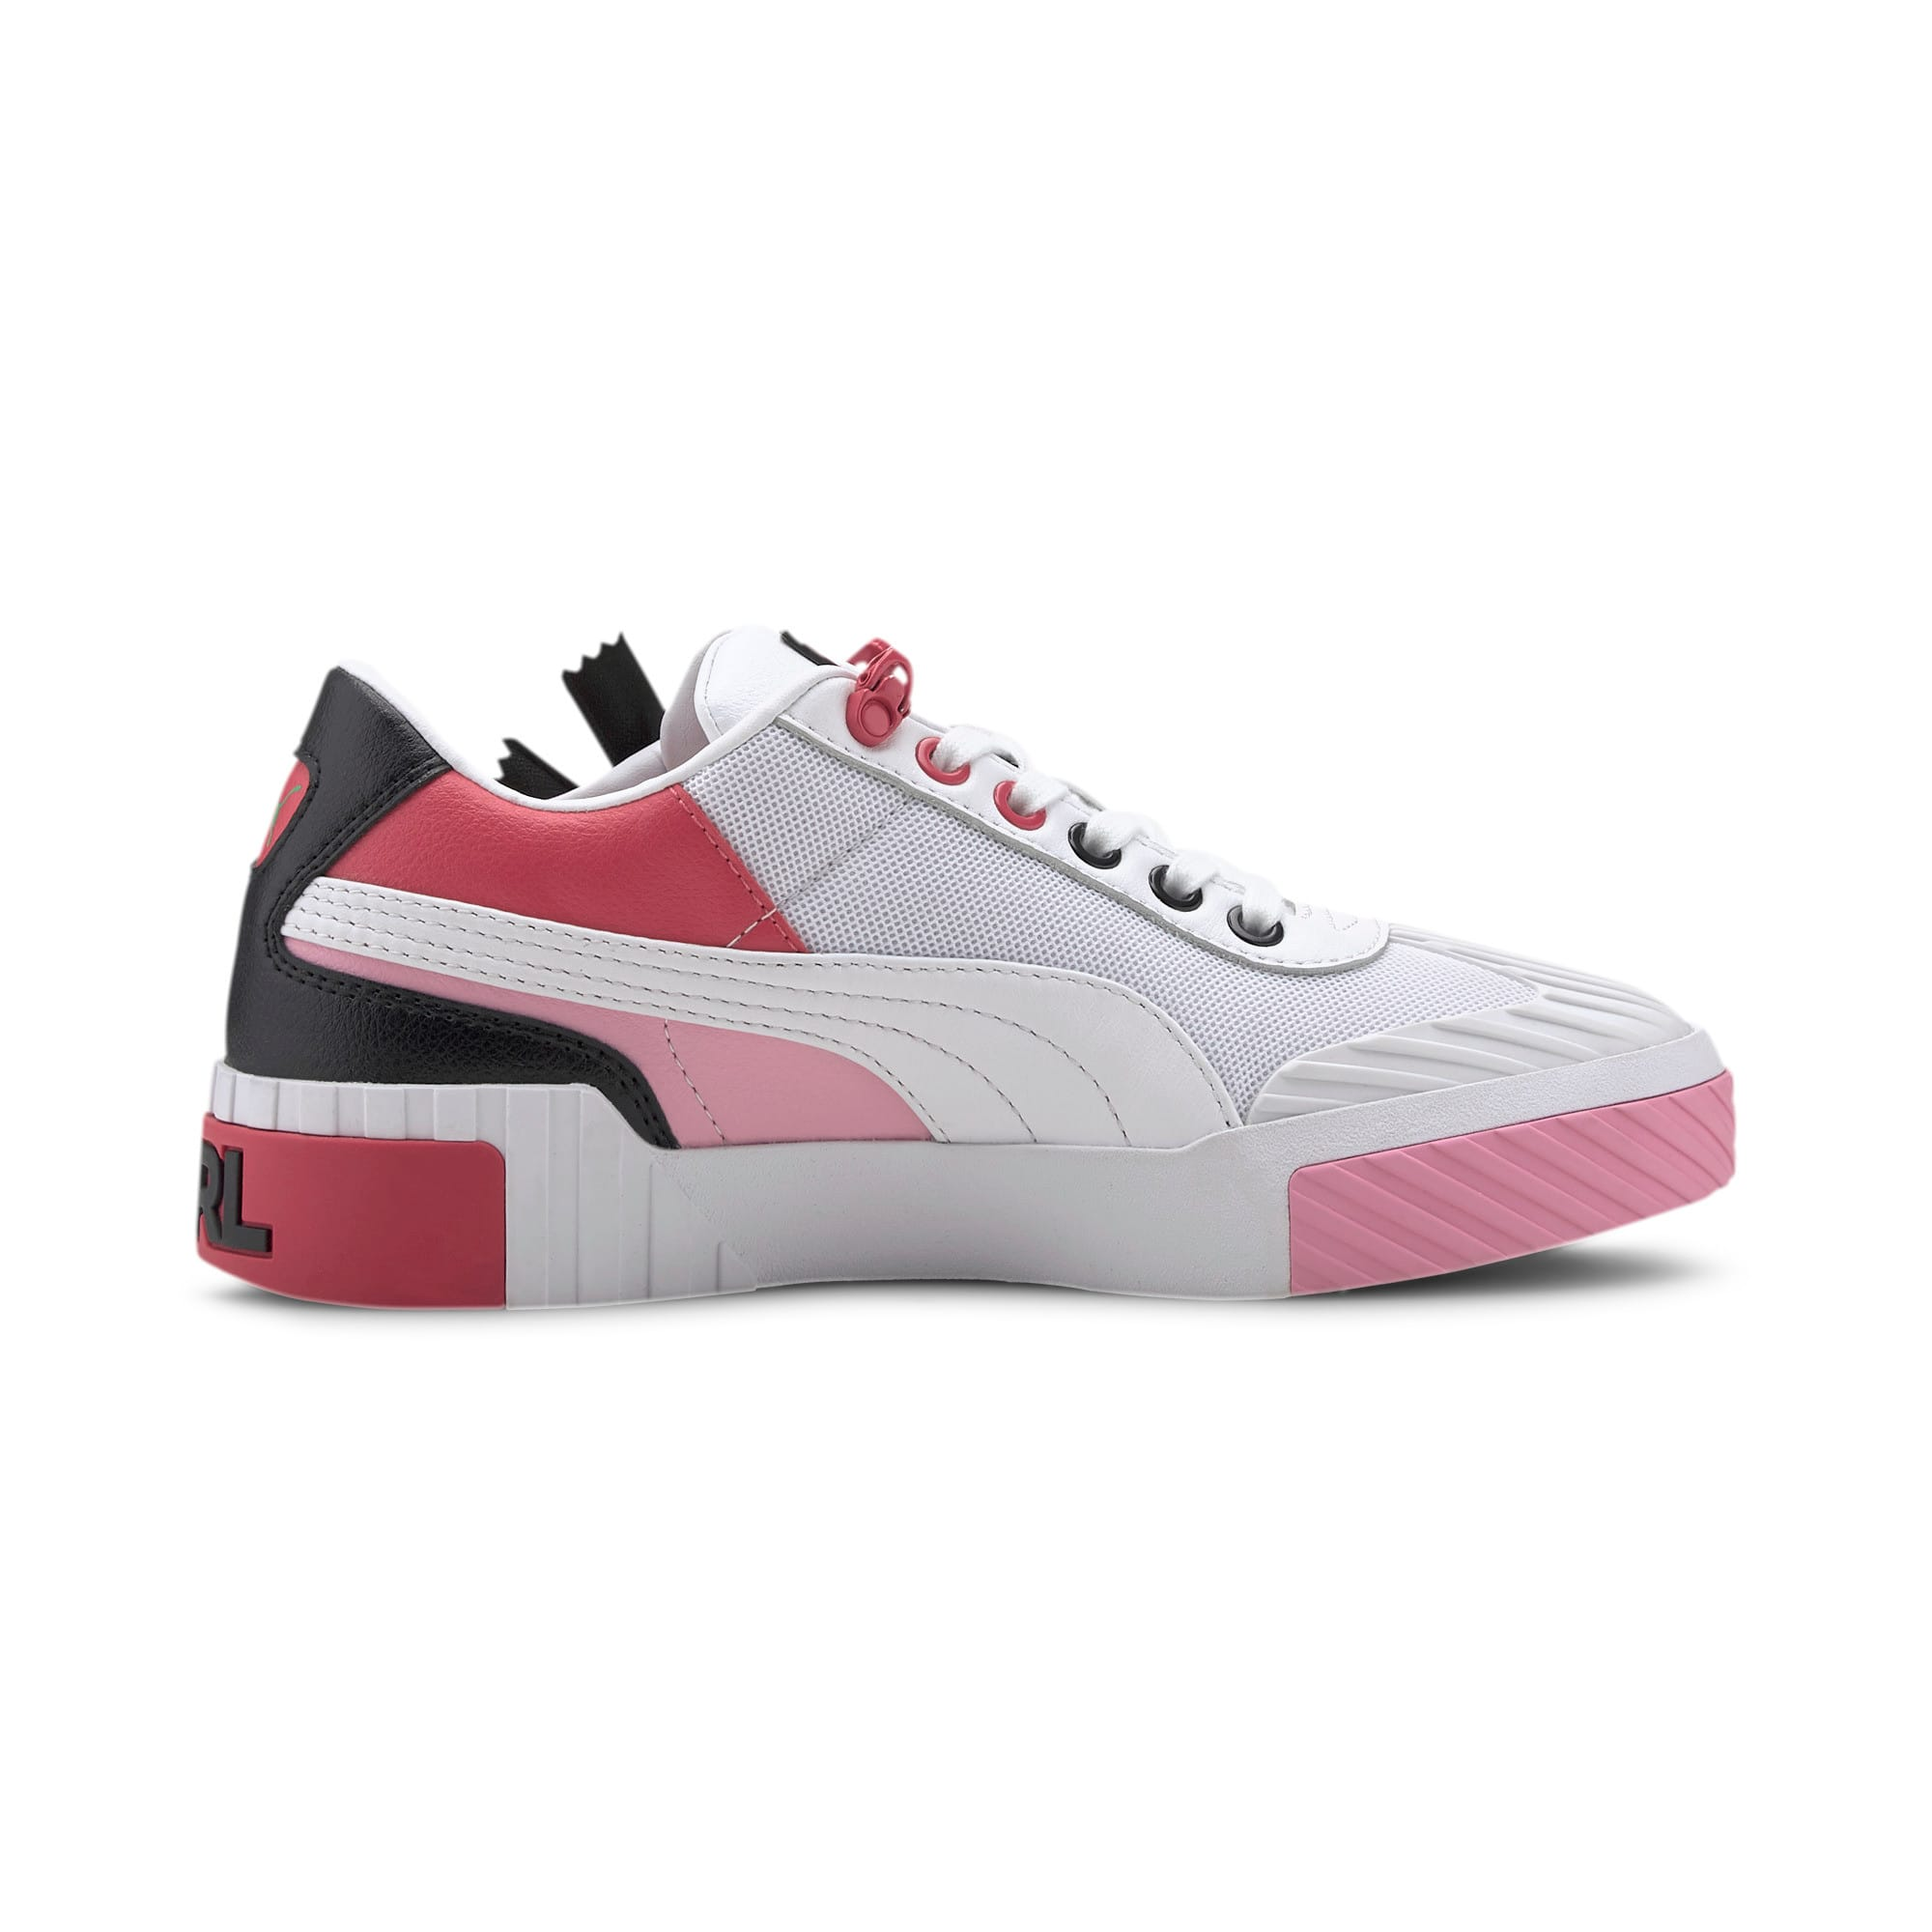 Thumbnail 6 of PUMA x KARL LAGERFELD Cali Women's Training Shoes, Puma White-PRISM PINK, medium